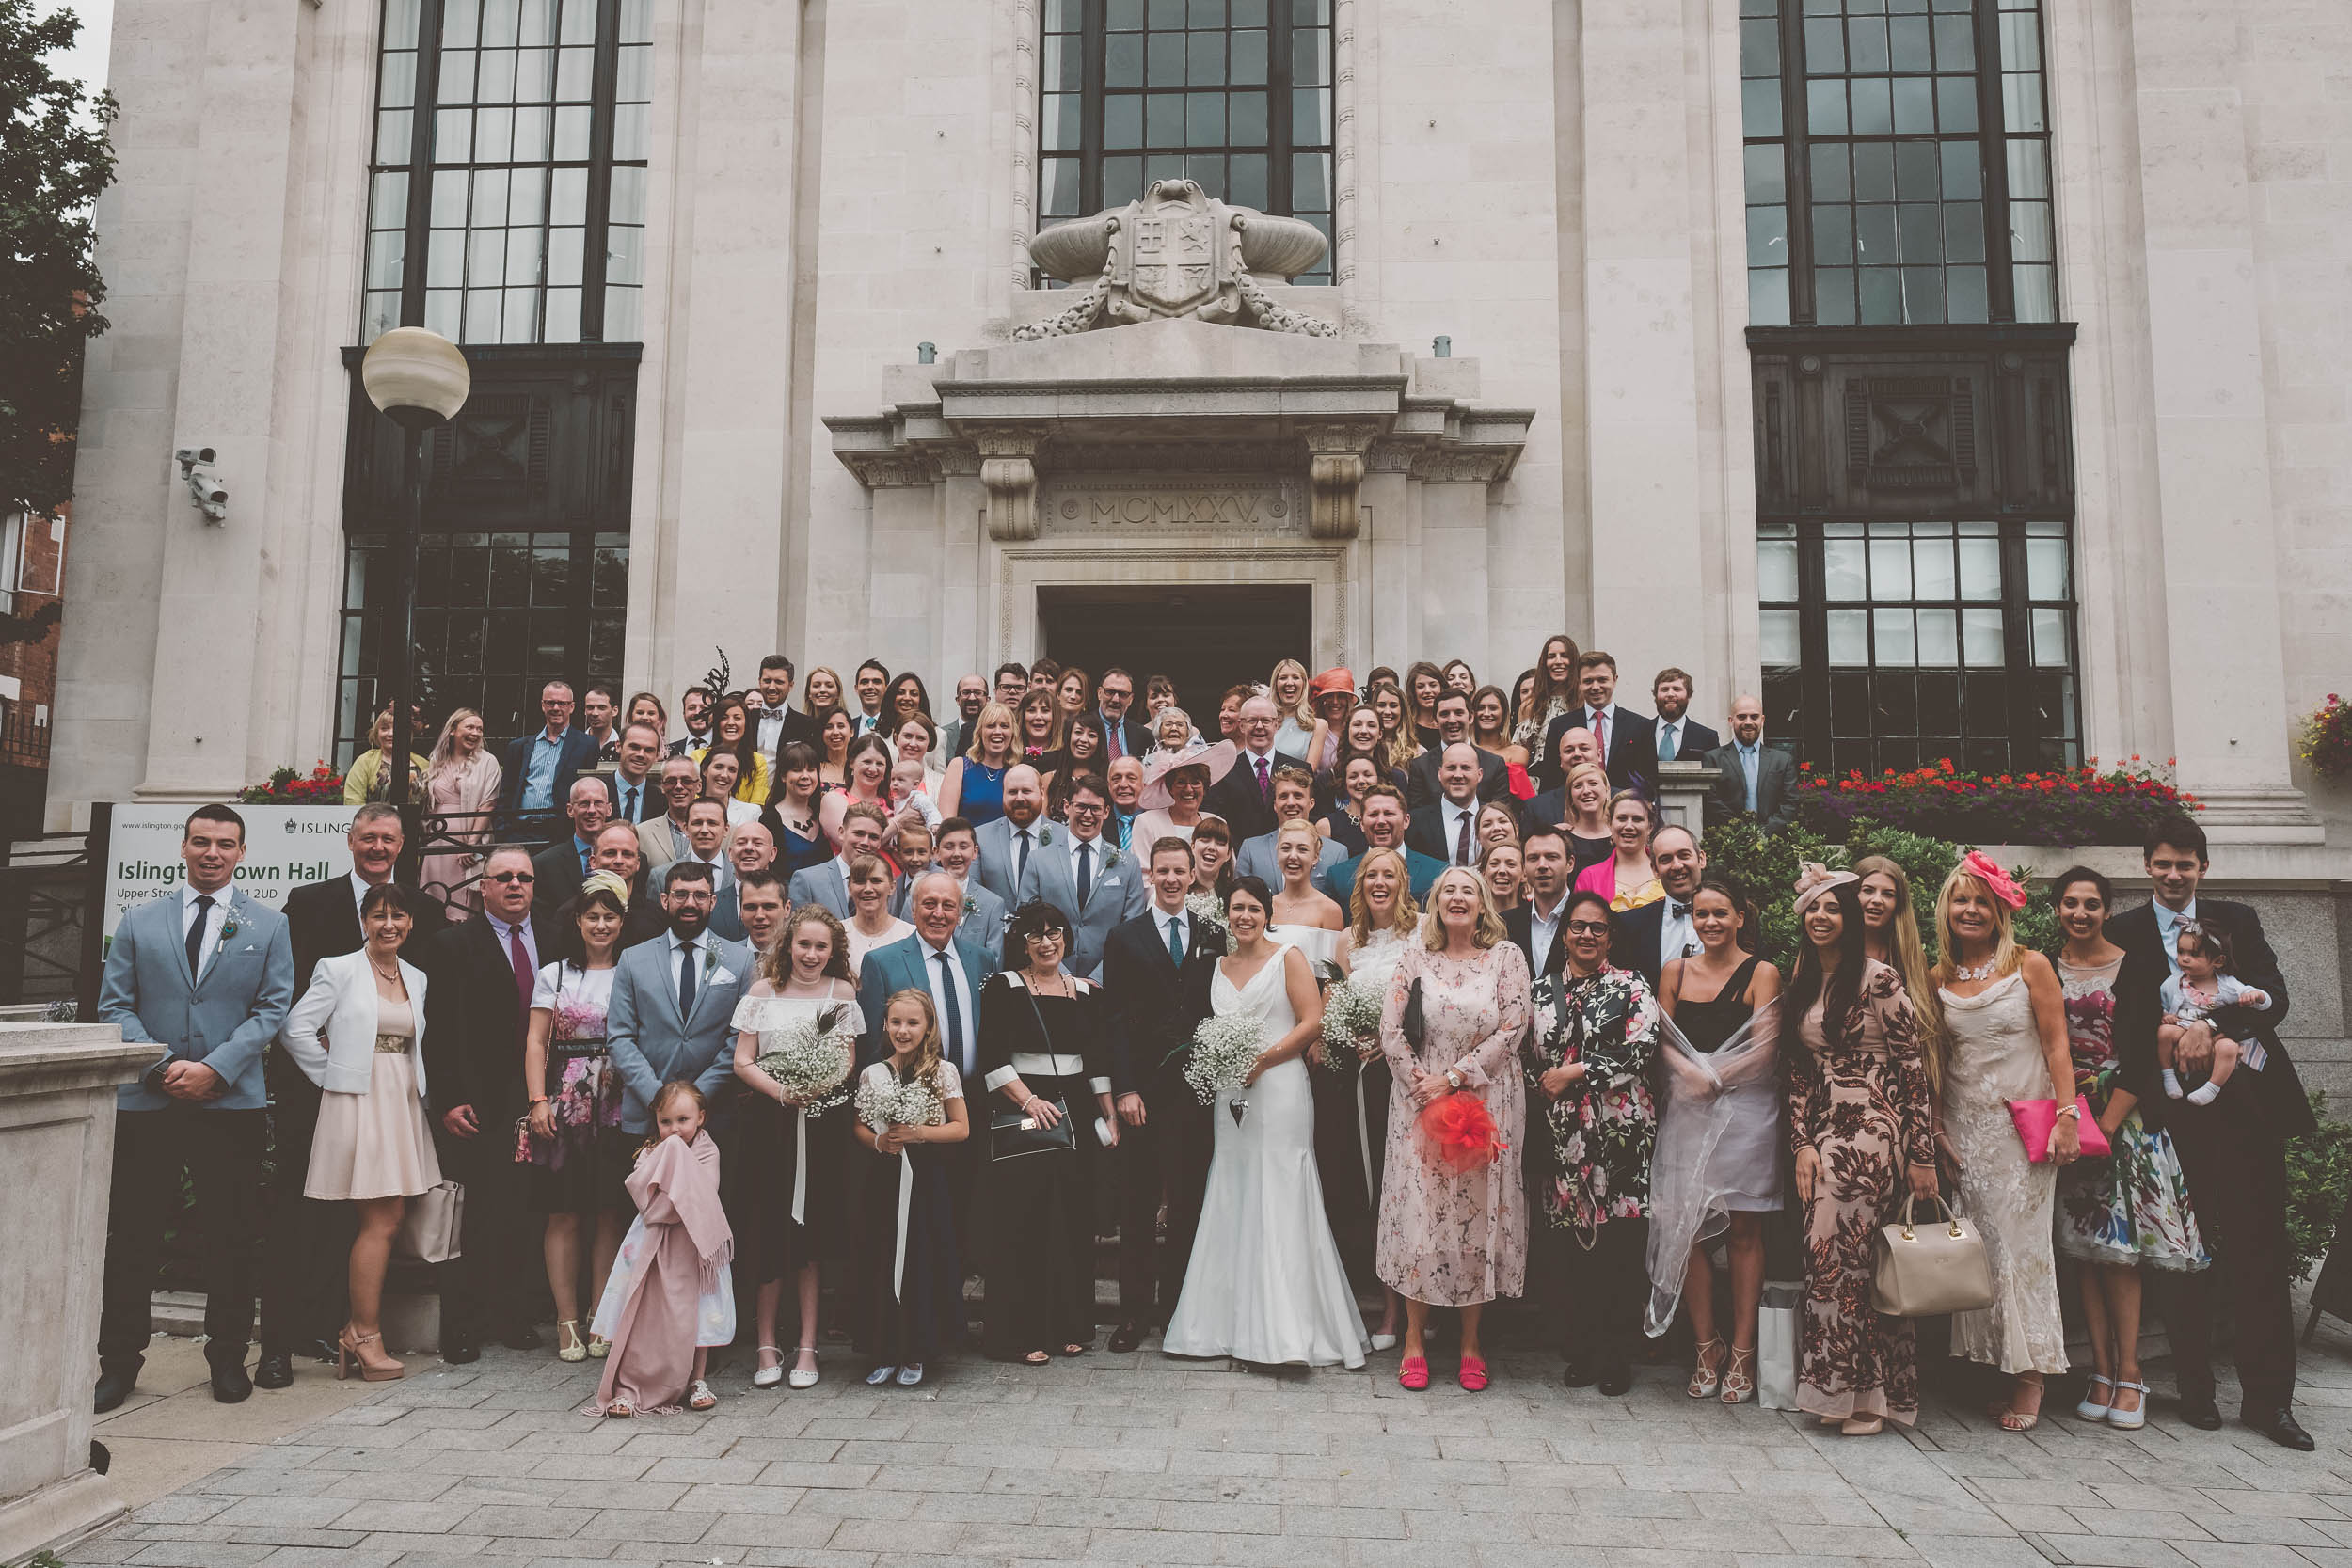 islington-town-hall-4th-floor-studios-wedding168.jpg